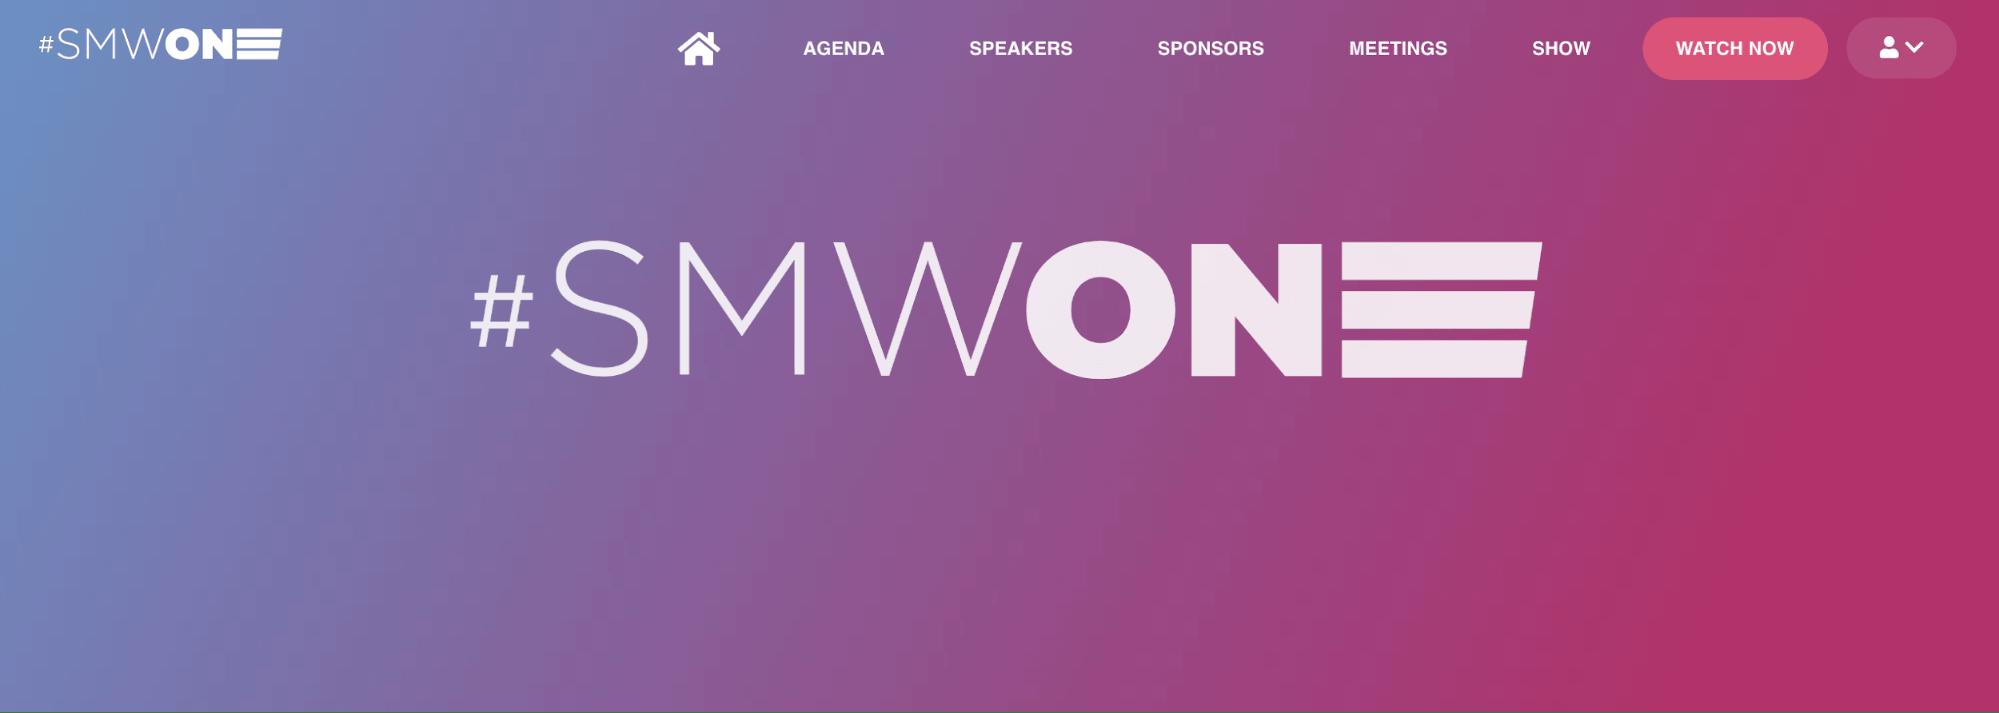 Social Media Week - SMWONE Virtual Event